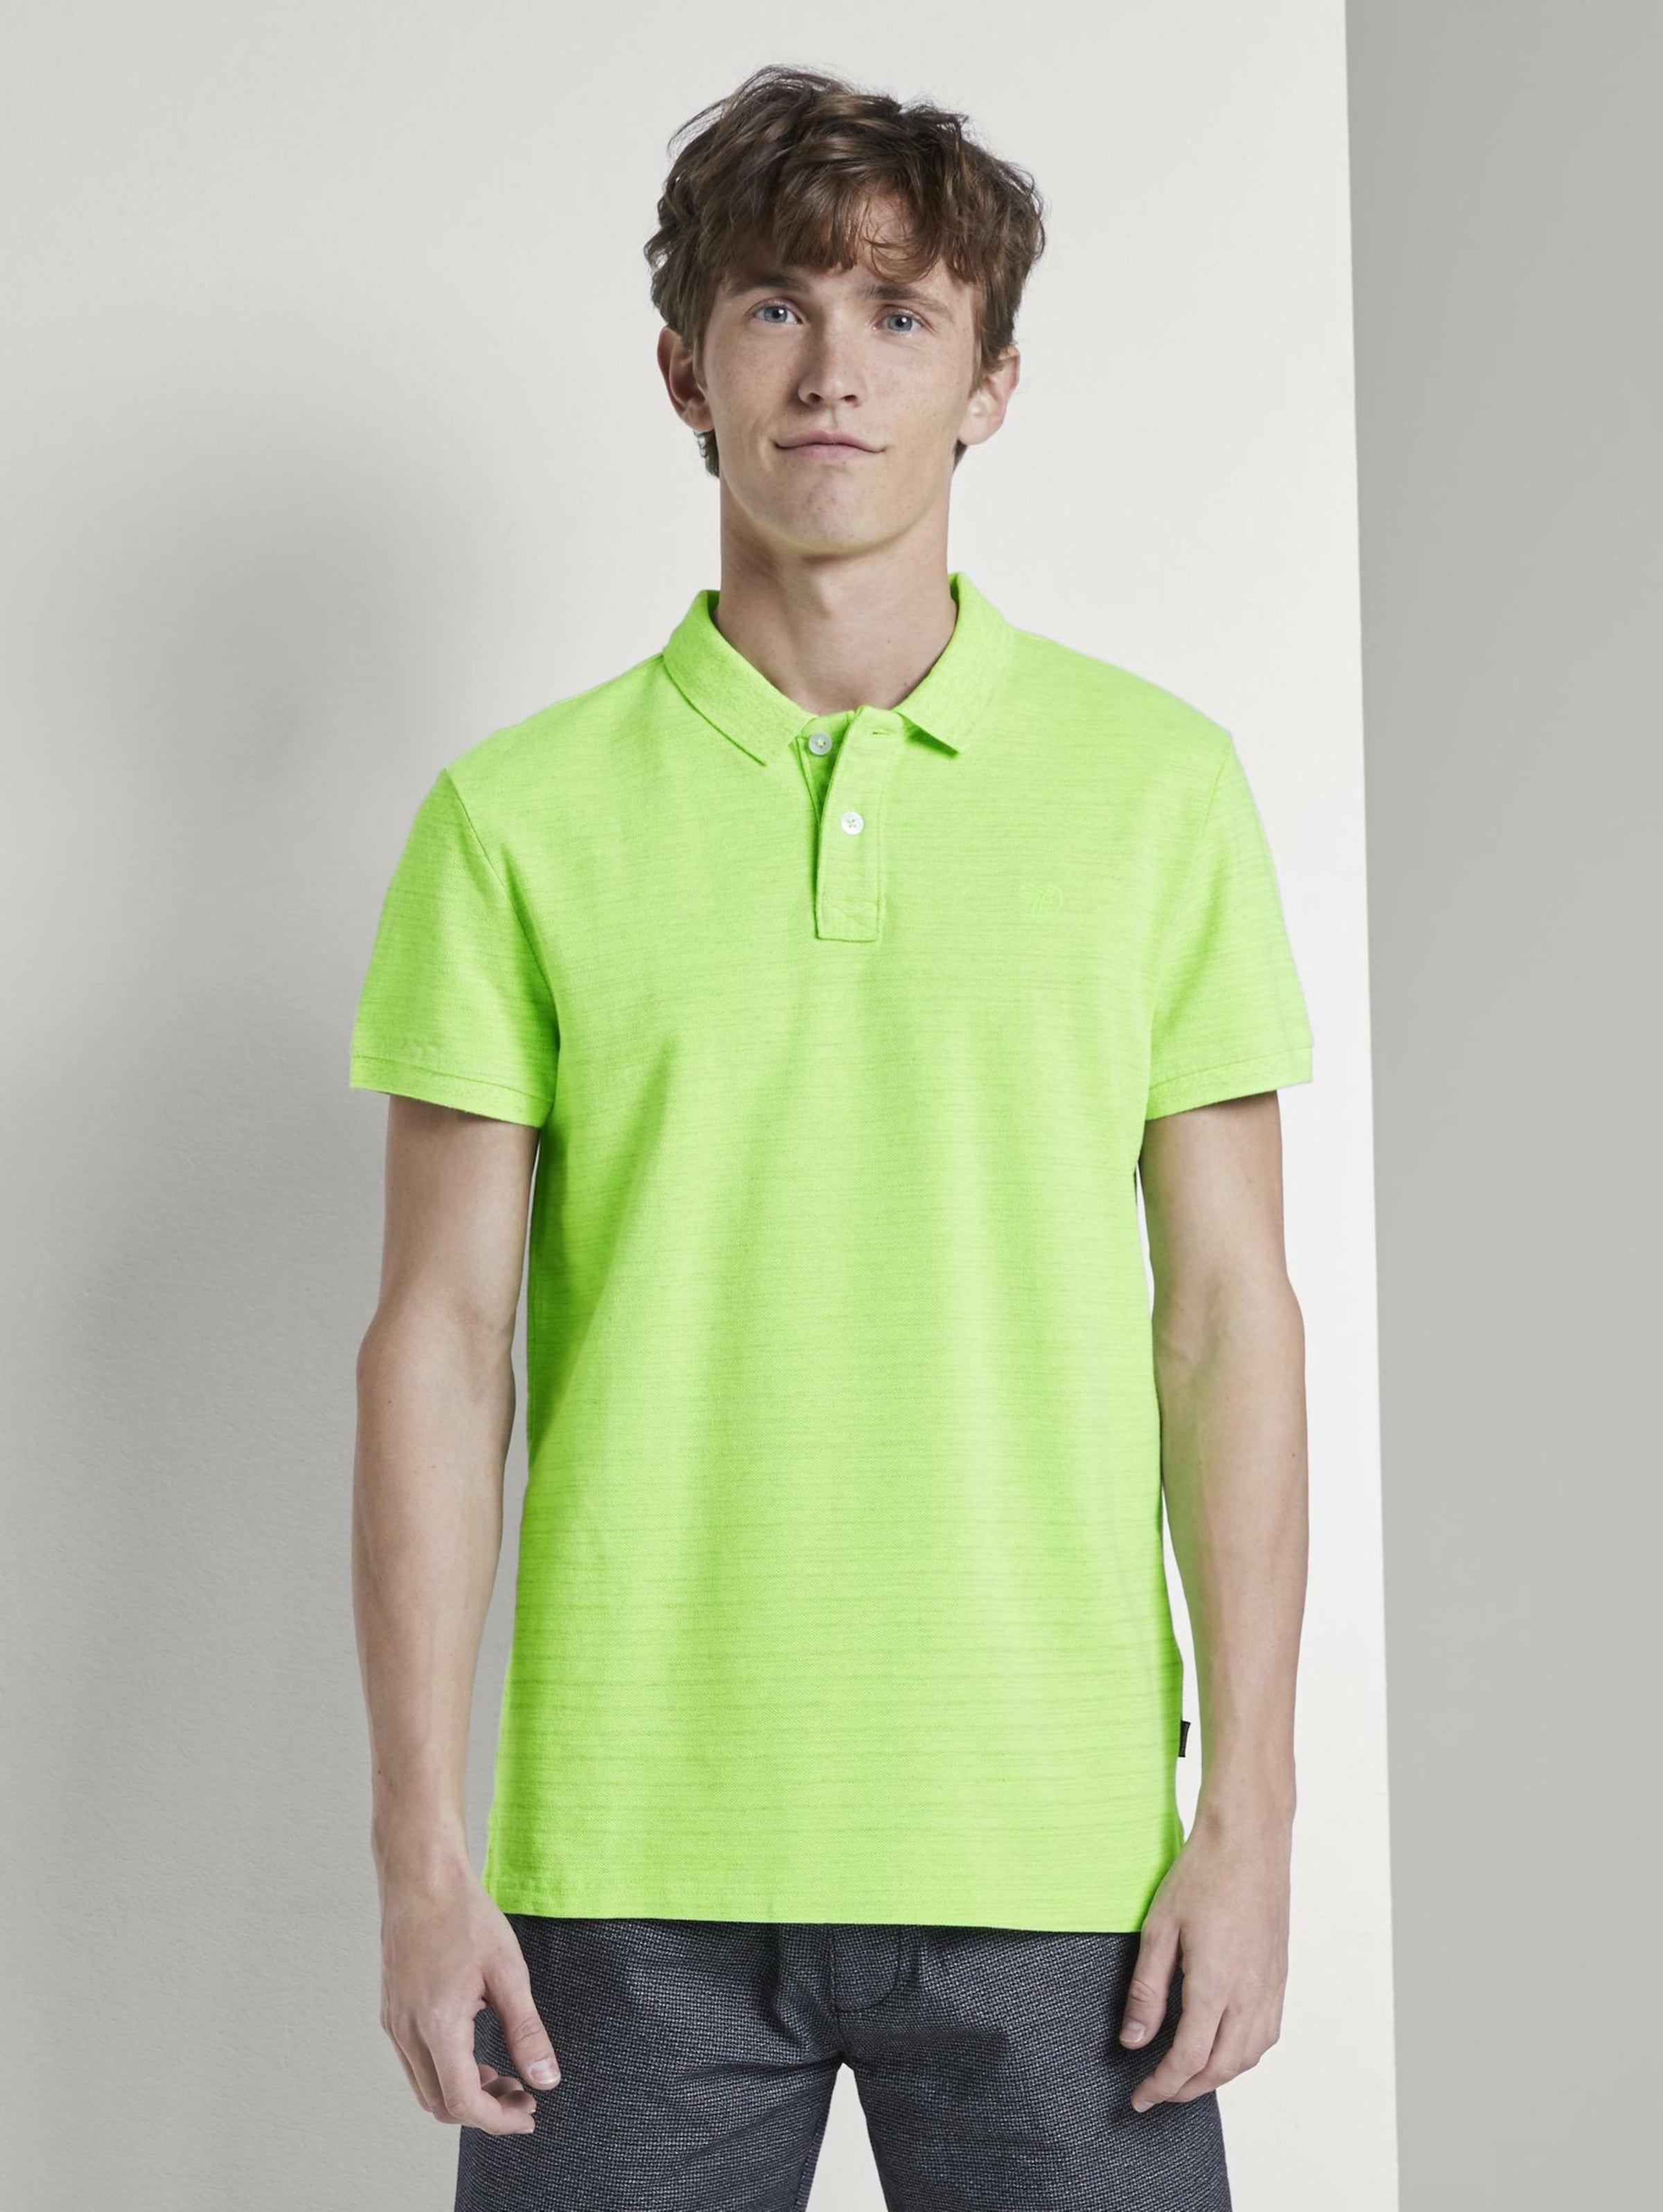 TOM TAILOR DENIM Poloshirts Poloshirt in Melange-Optik mit Stickerei in neongrün Unifarben 1018754028